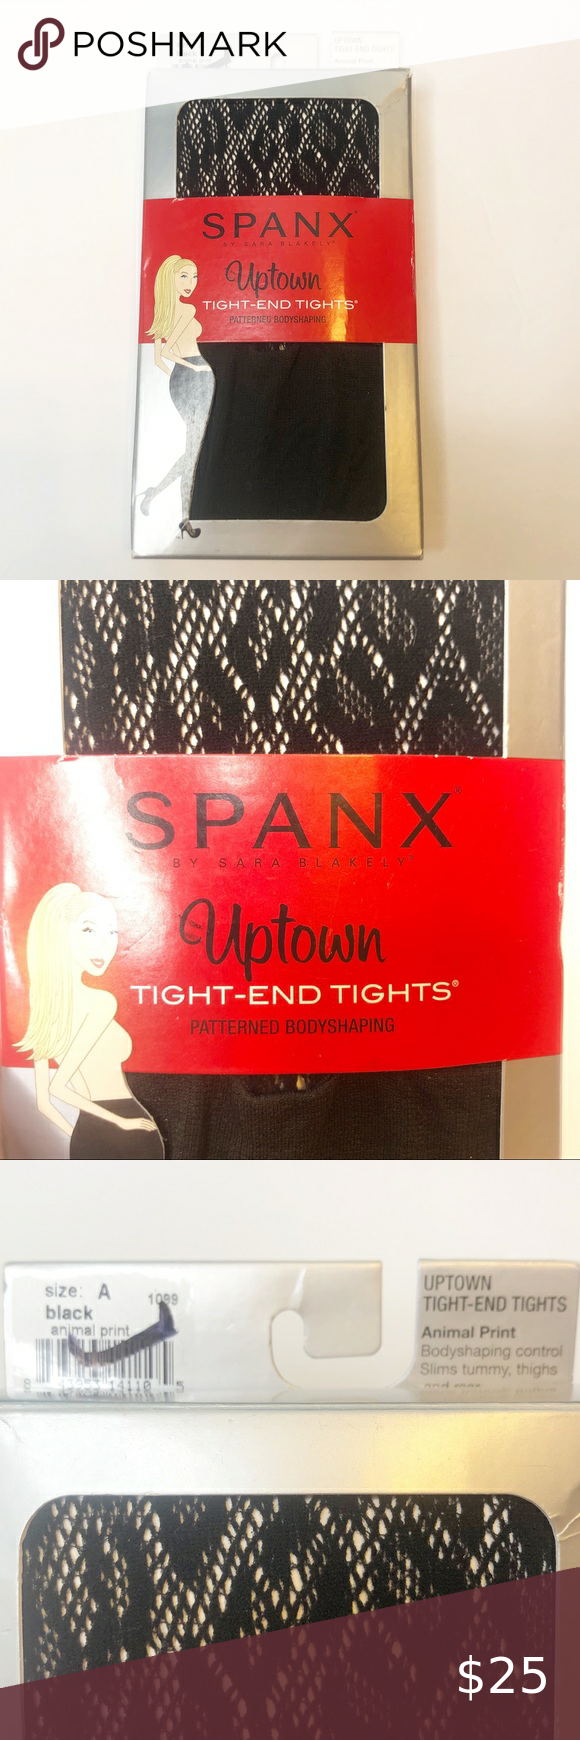 SPANX Uptown Tight-End-Tights Animal Print 1099 Black